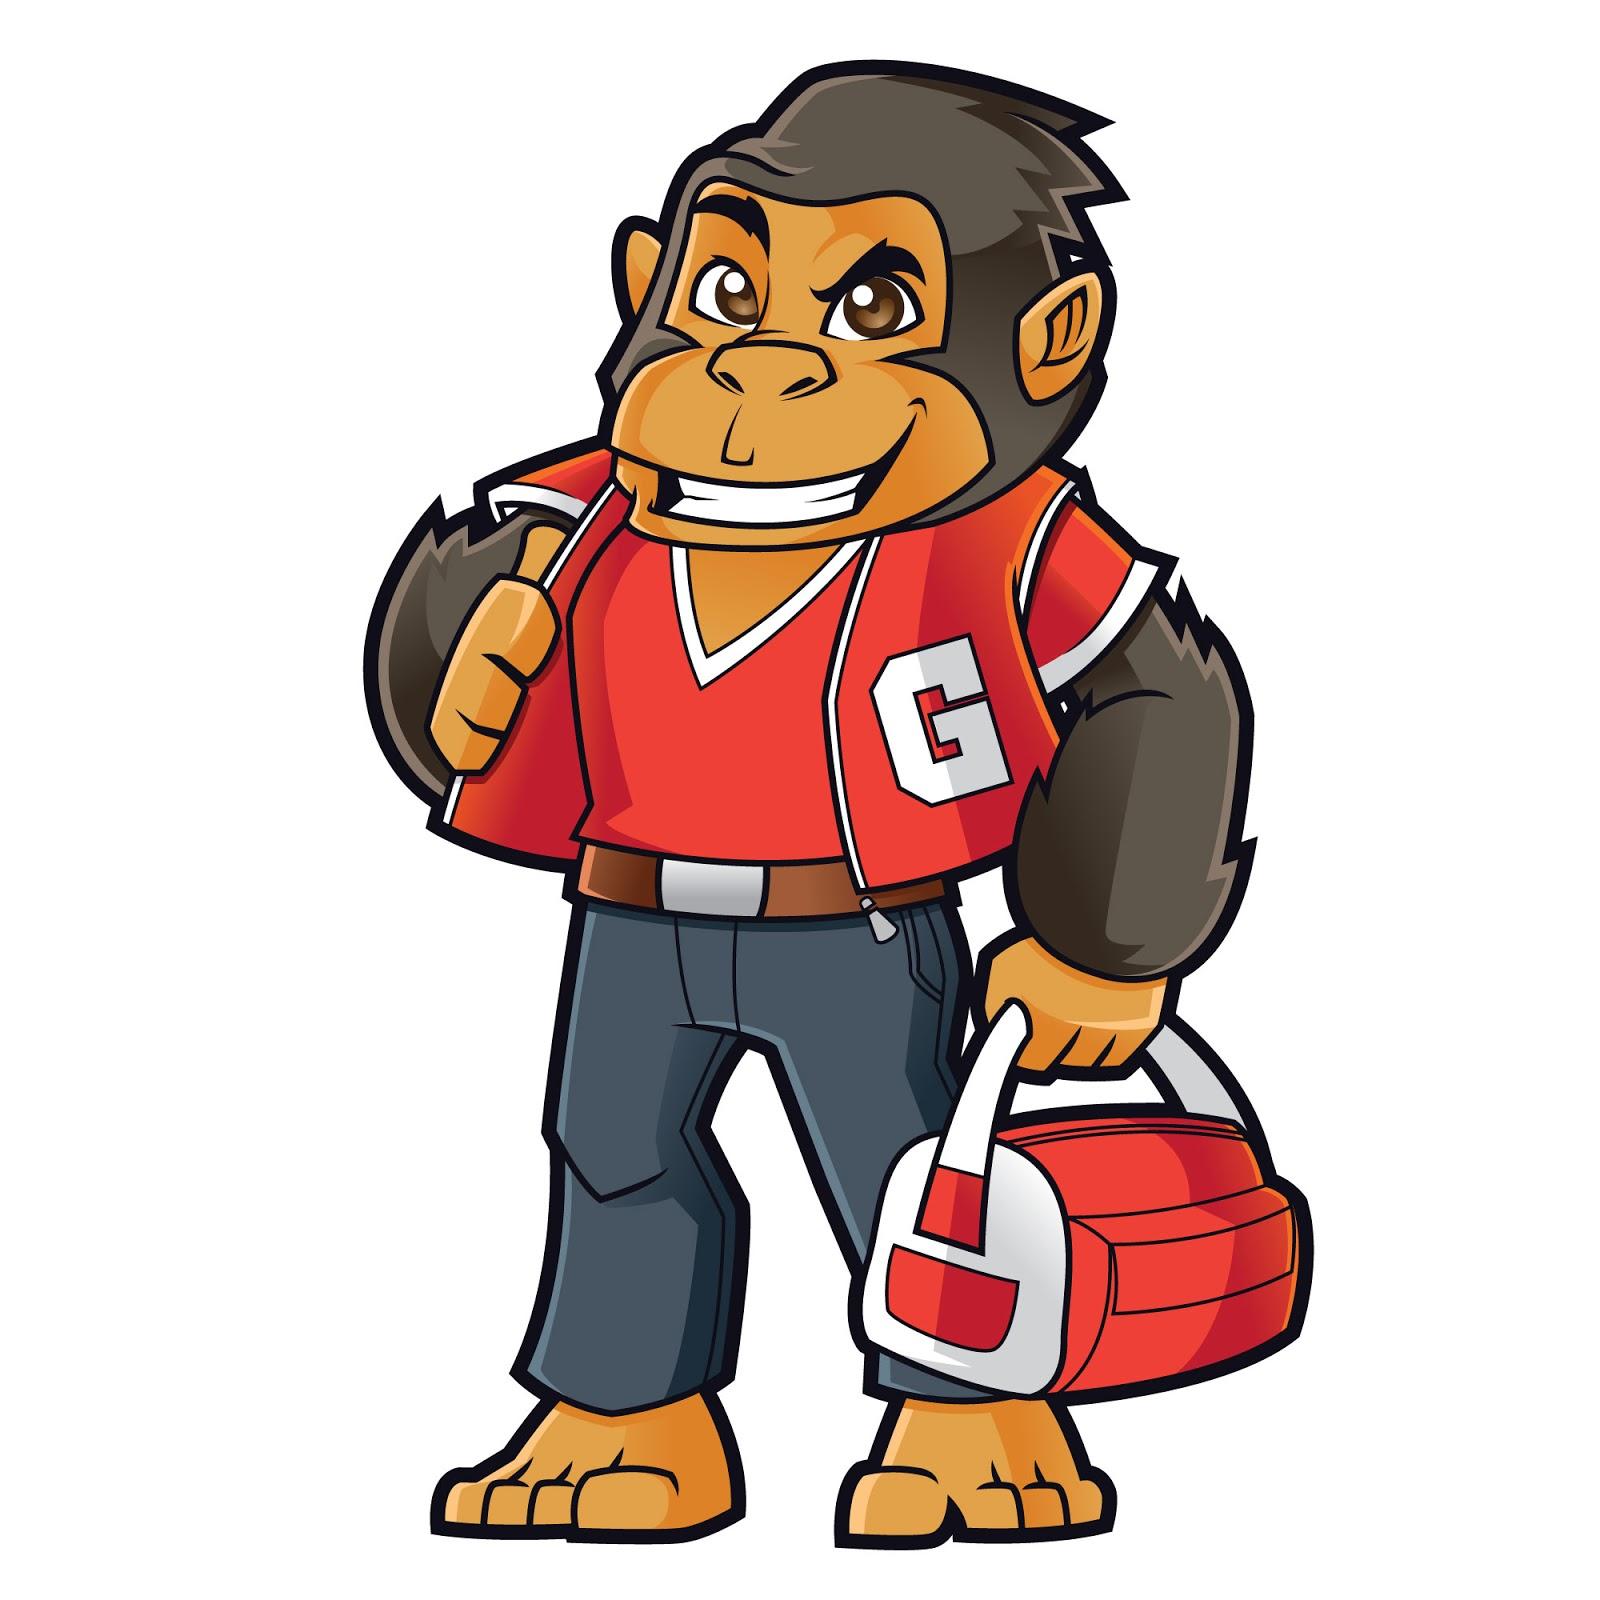 Gorilla Mascot Logo Free Download Vector CDR, AI, EPS and PNG Formats